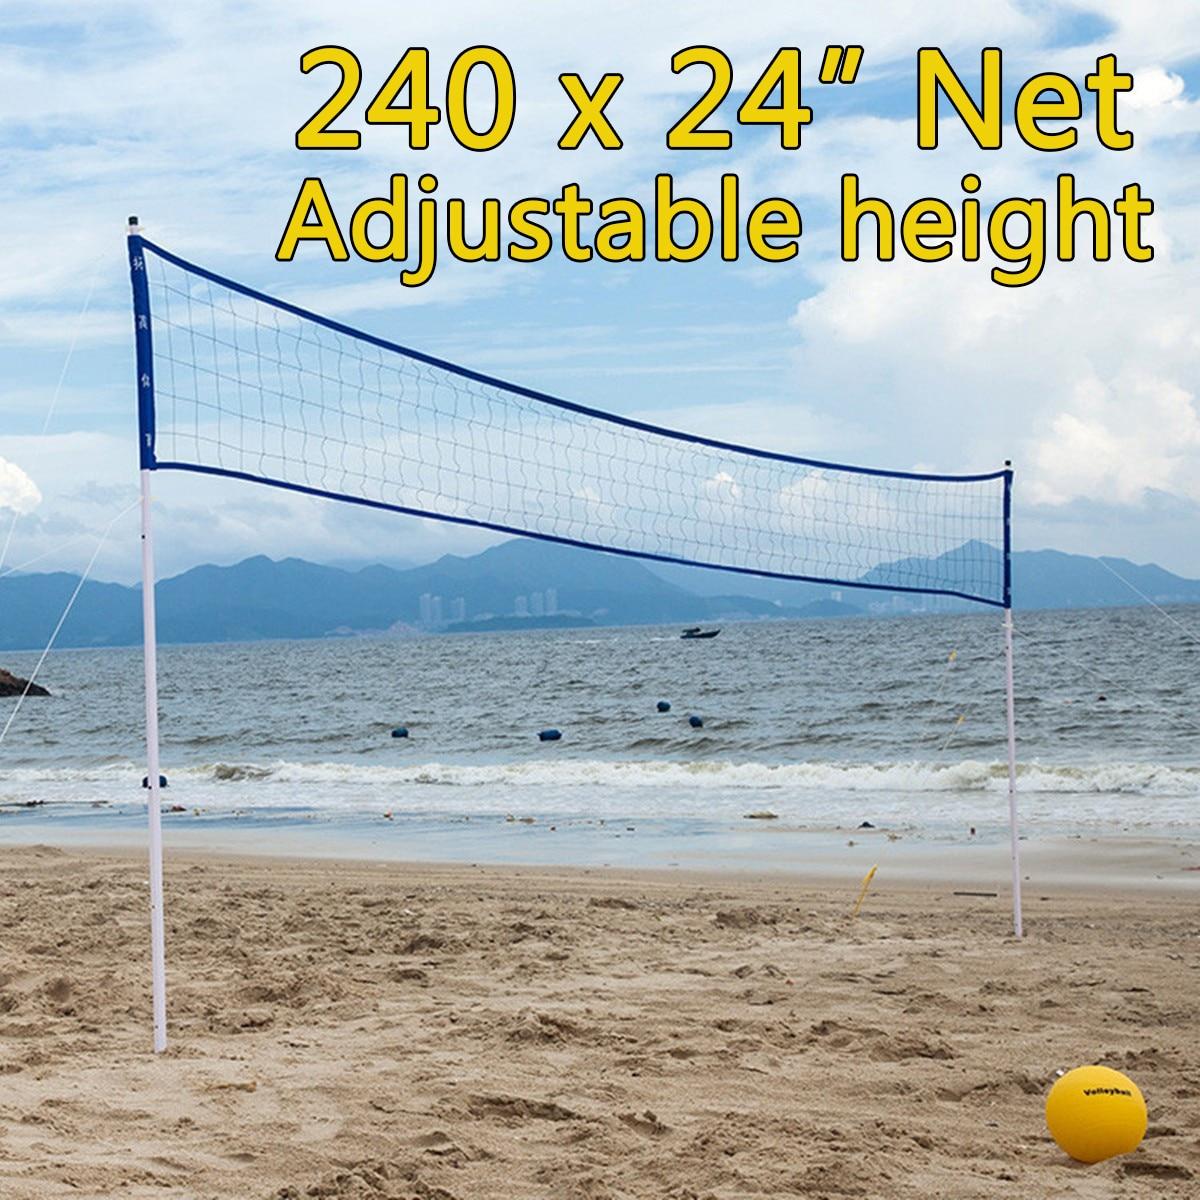 цена на Outdoor Sports Beach Volleyball Net Set Adjustable Posts With Volleyball Pump Storage Bag Volleyball Training Equipment